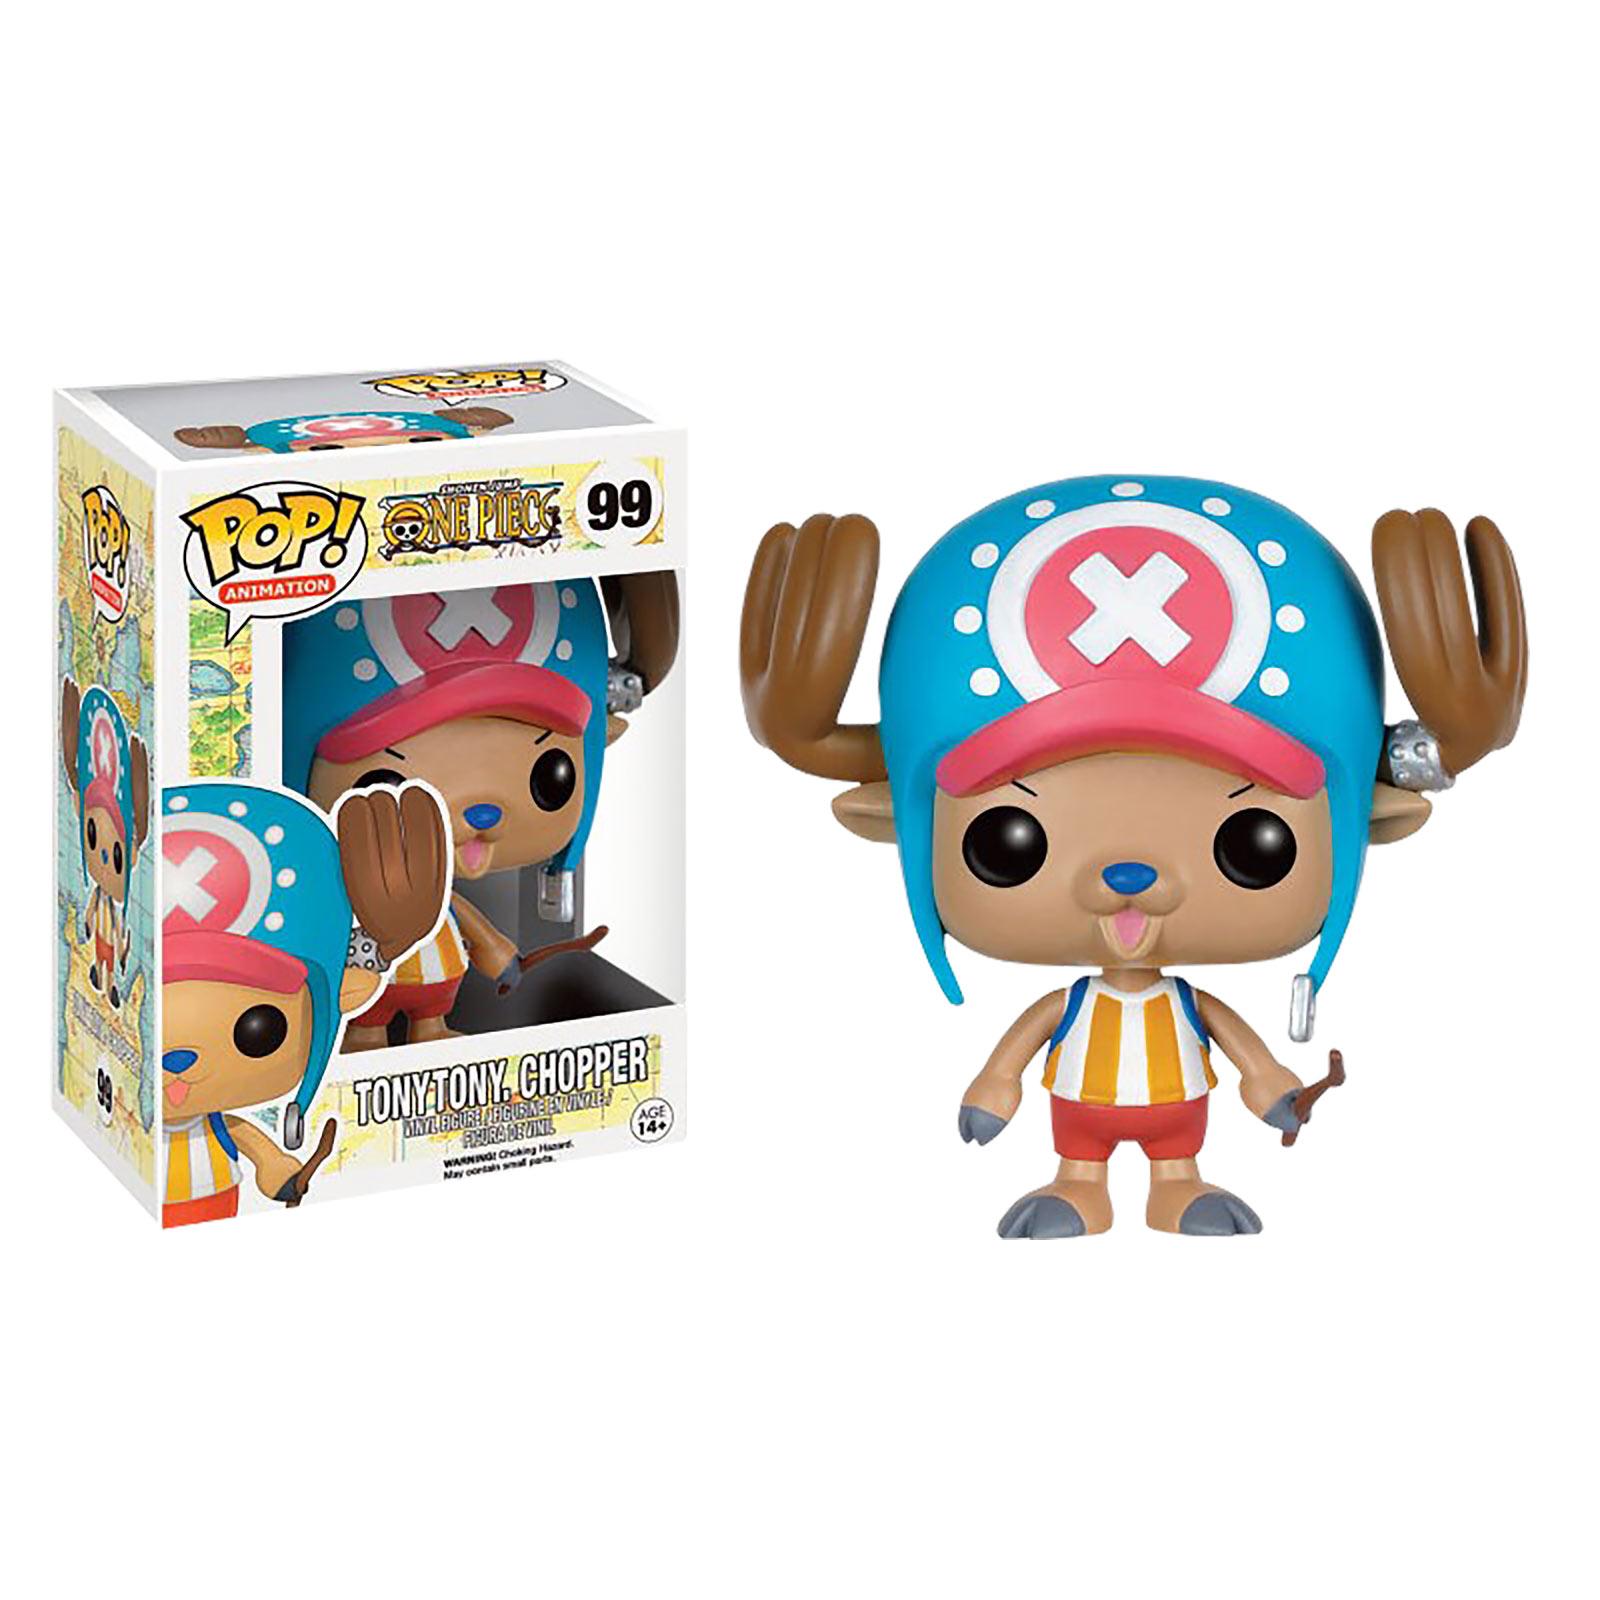 One Piece - Tony Chopper Mini-Figur